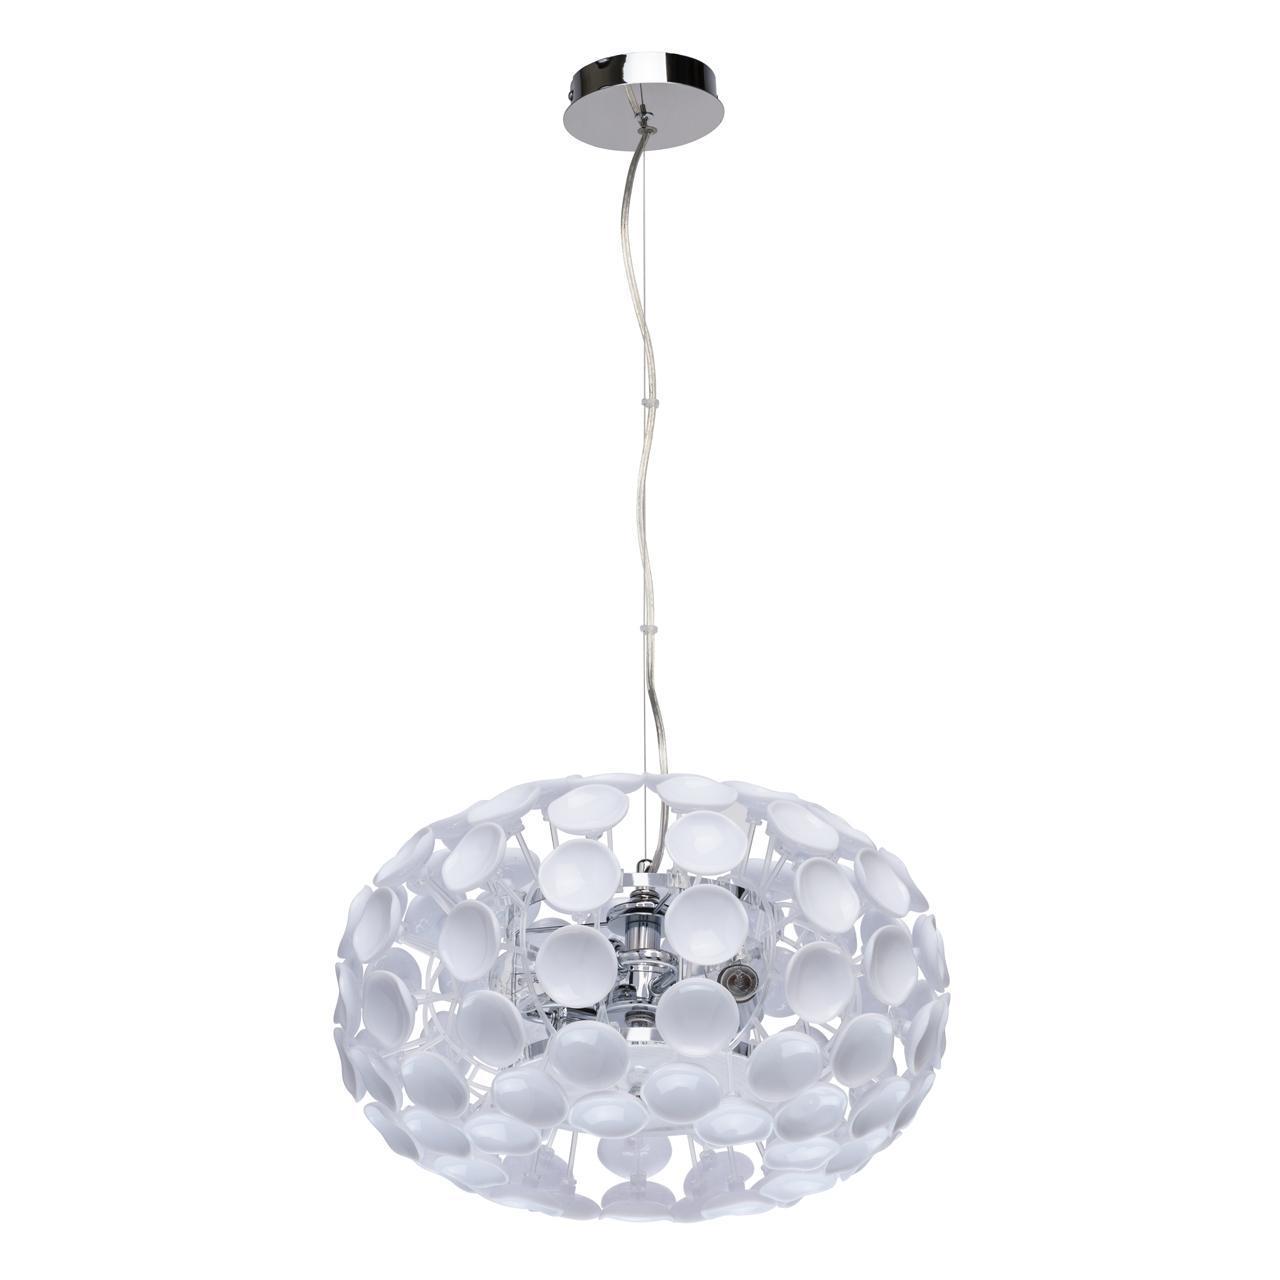 Подвесной светильник MW-Light Виола 298012803 подвесной светильник mw light сандра 811010301 page 6